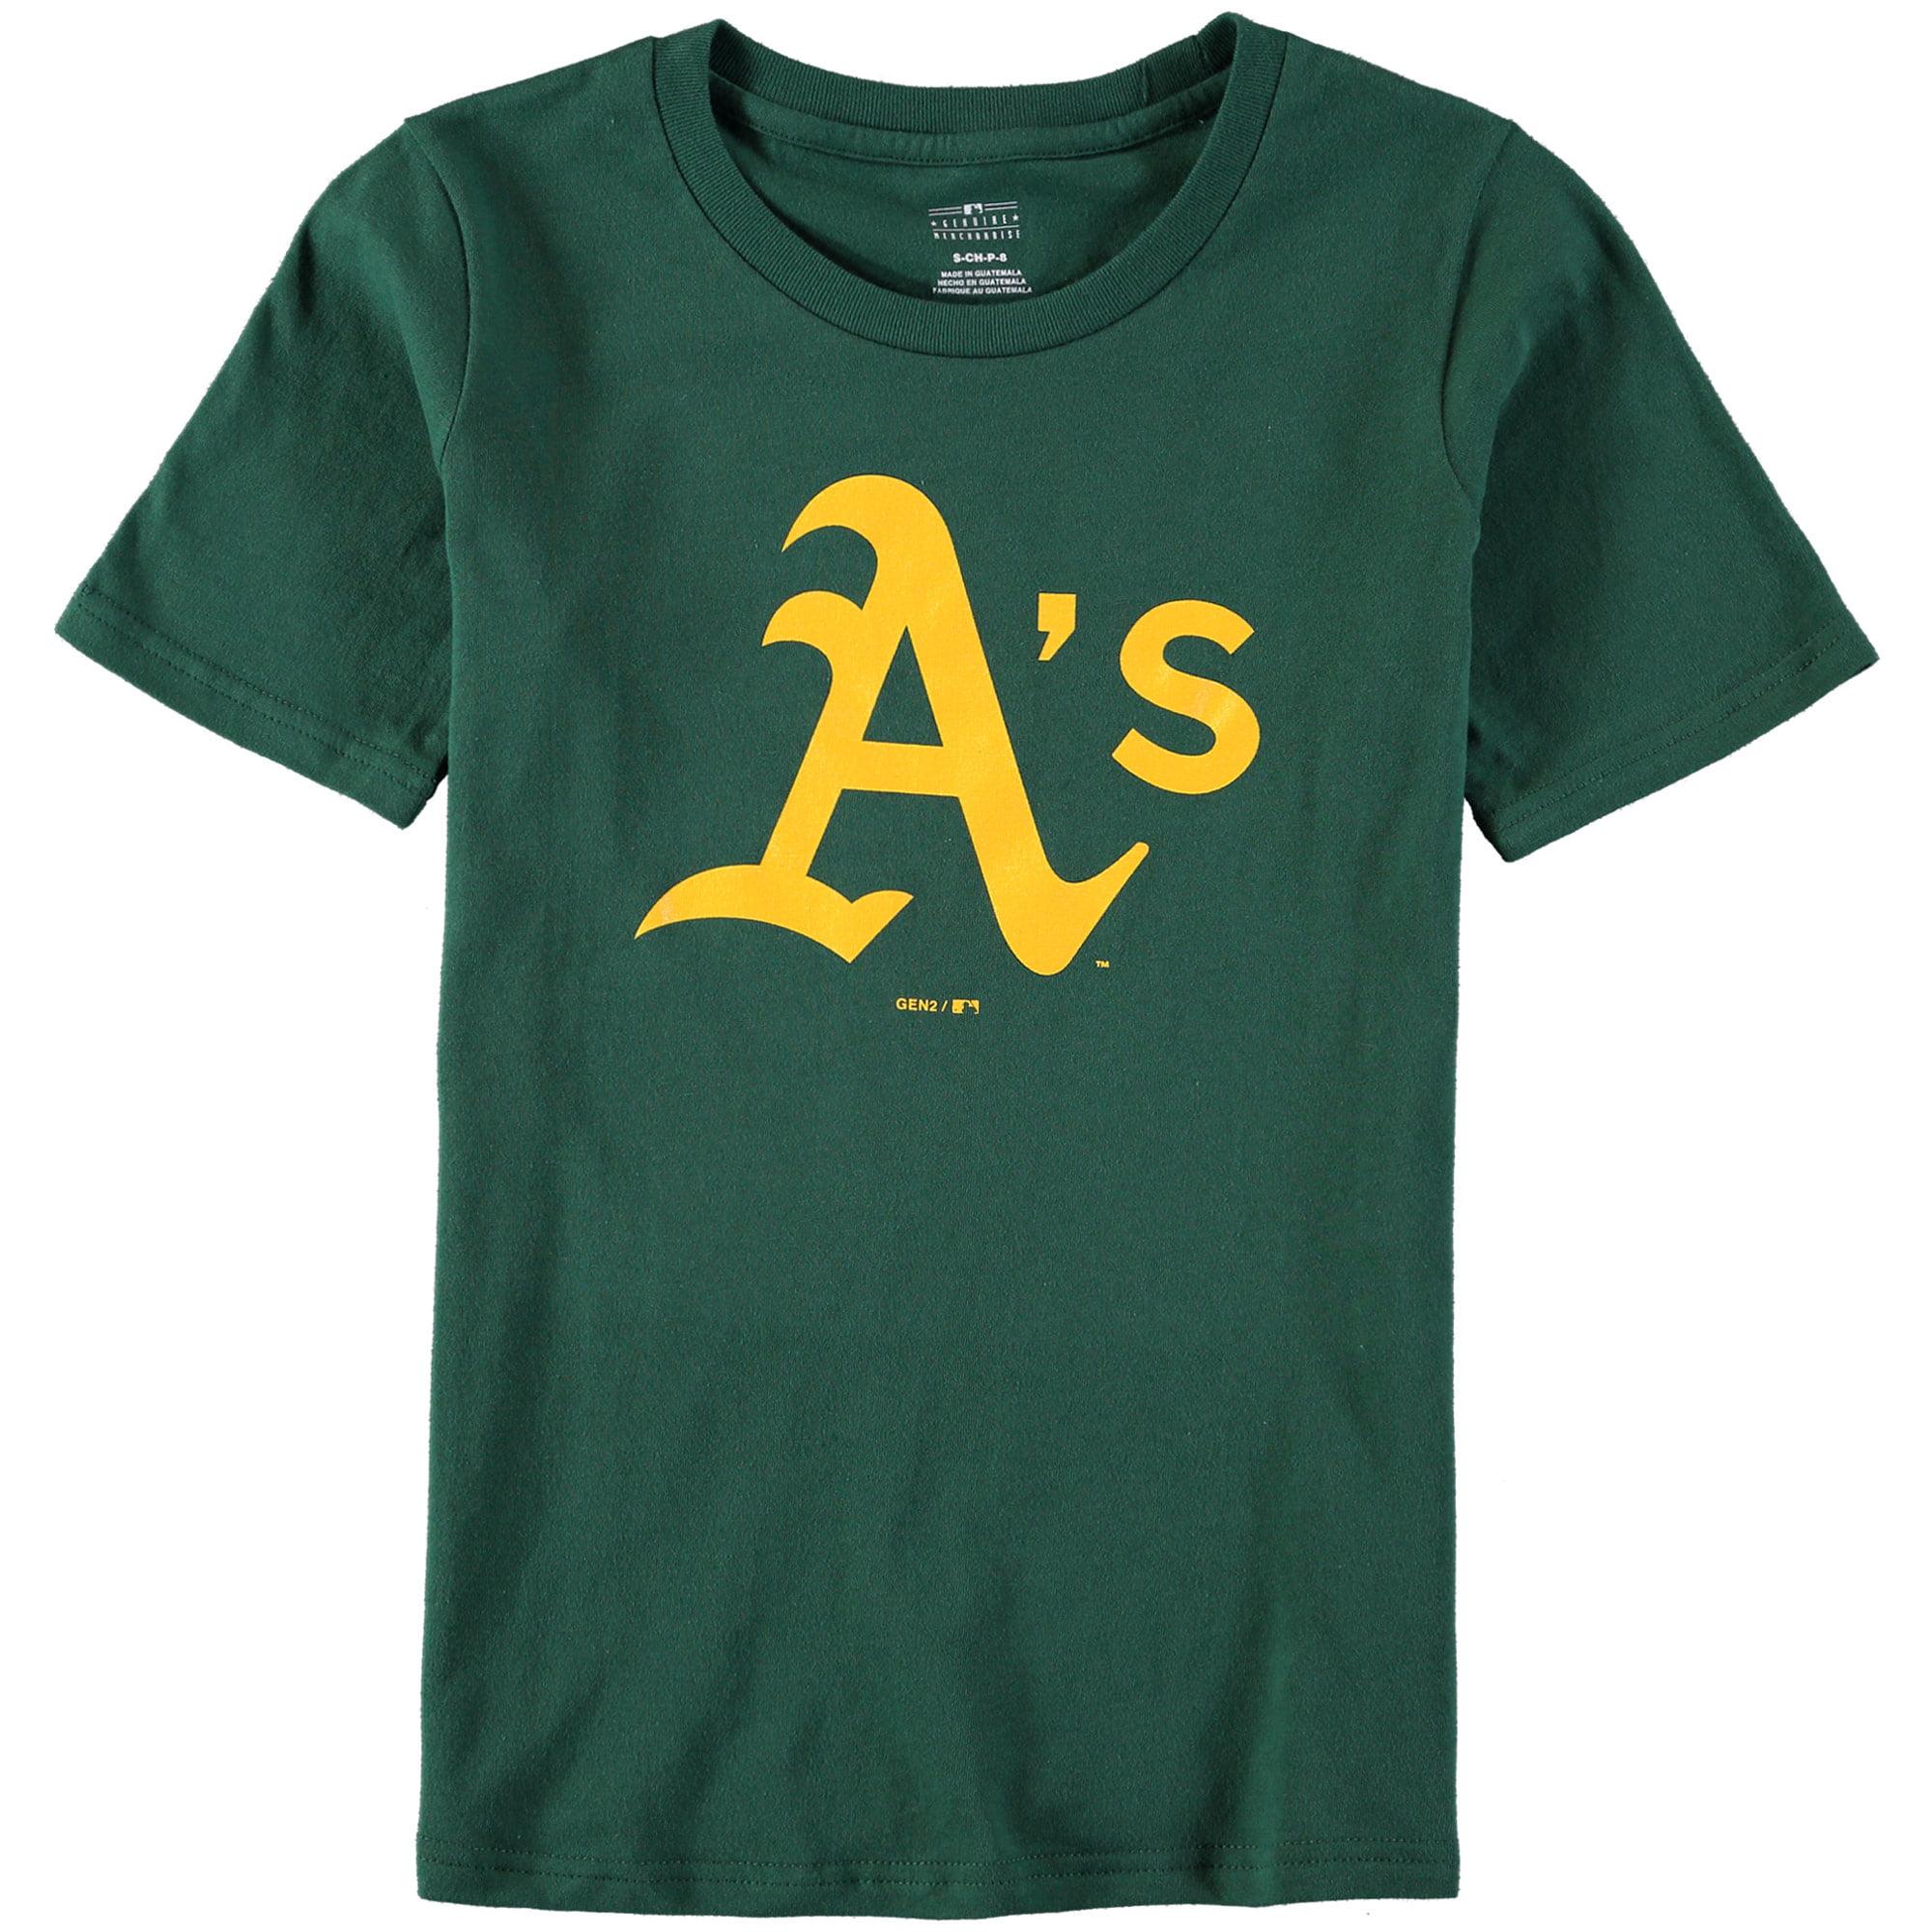 Oakland Athletics Youth Primary Logo T-Shirt - Green